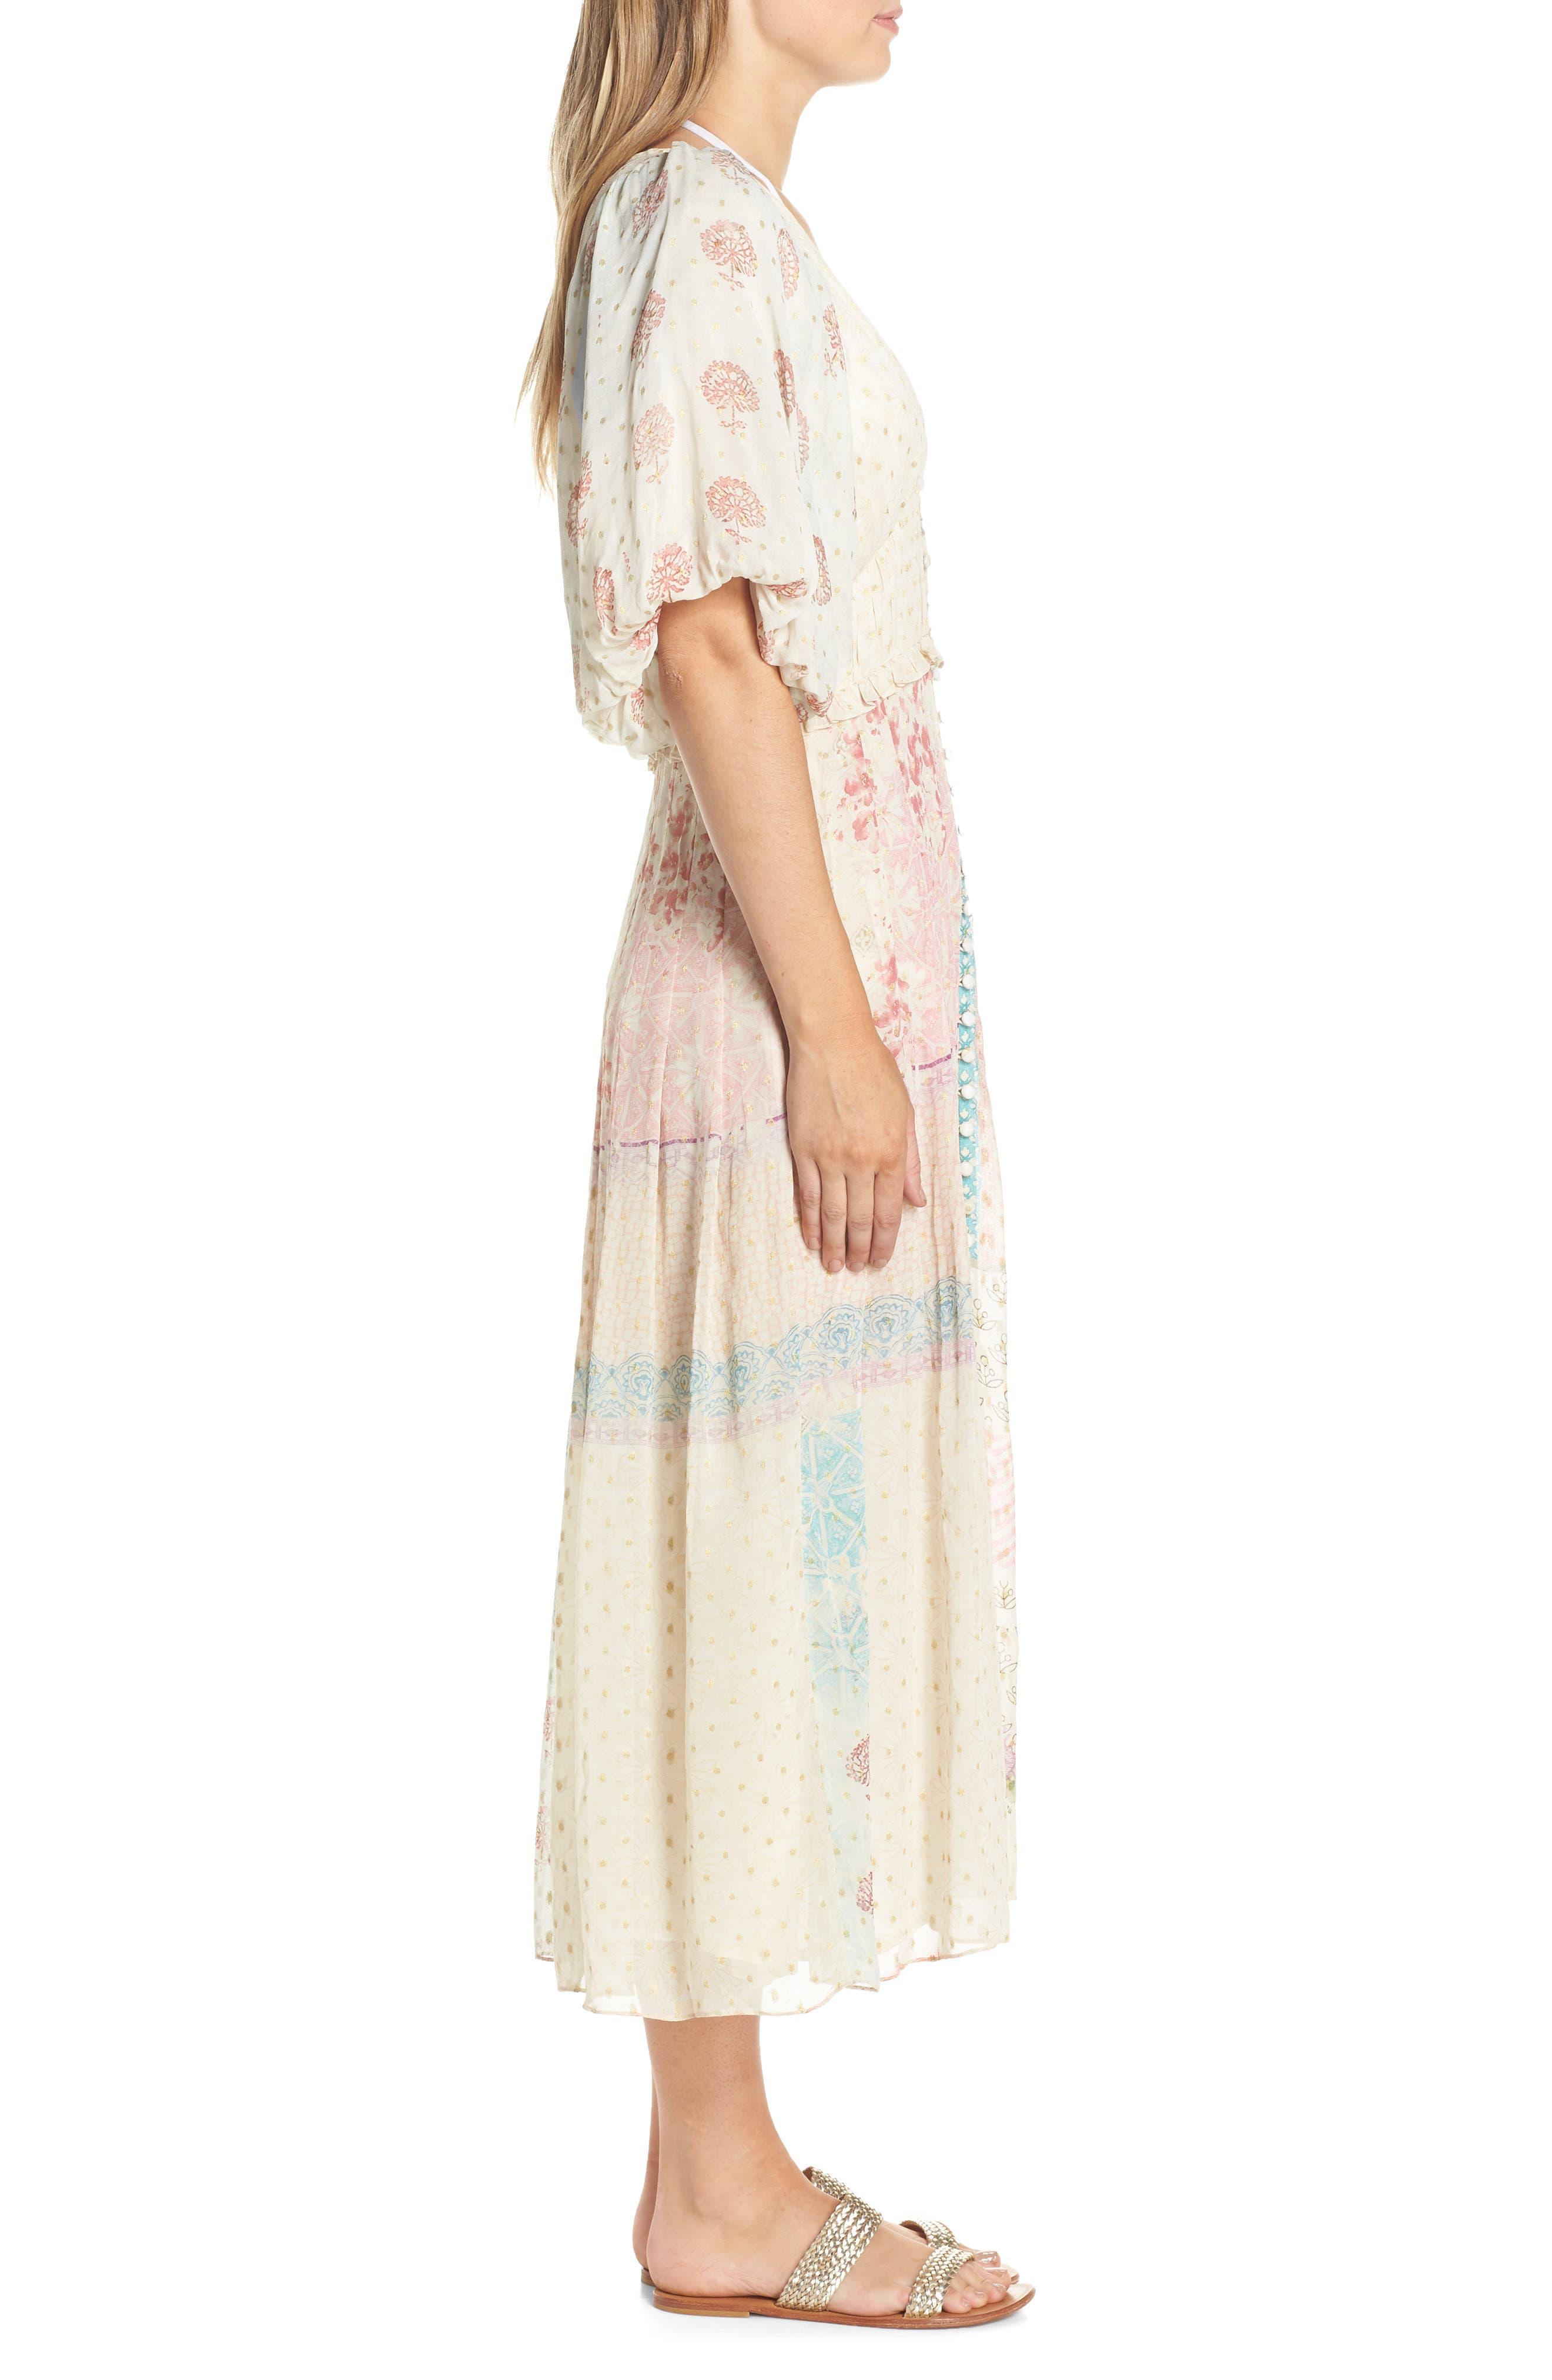 HEMANT & NANDITA, Cover-Up Maxi Dress, Alternate thumbnail 3, color, PASTEL